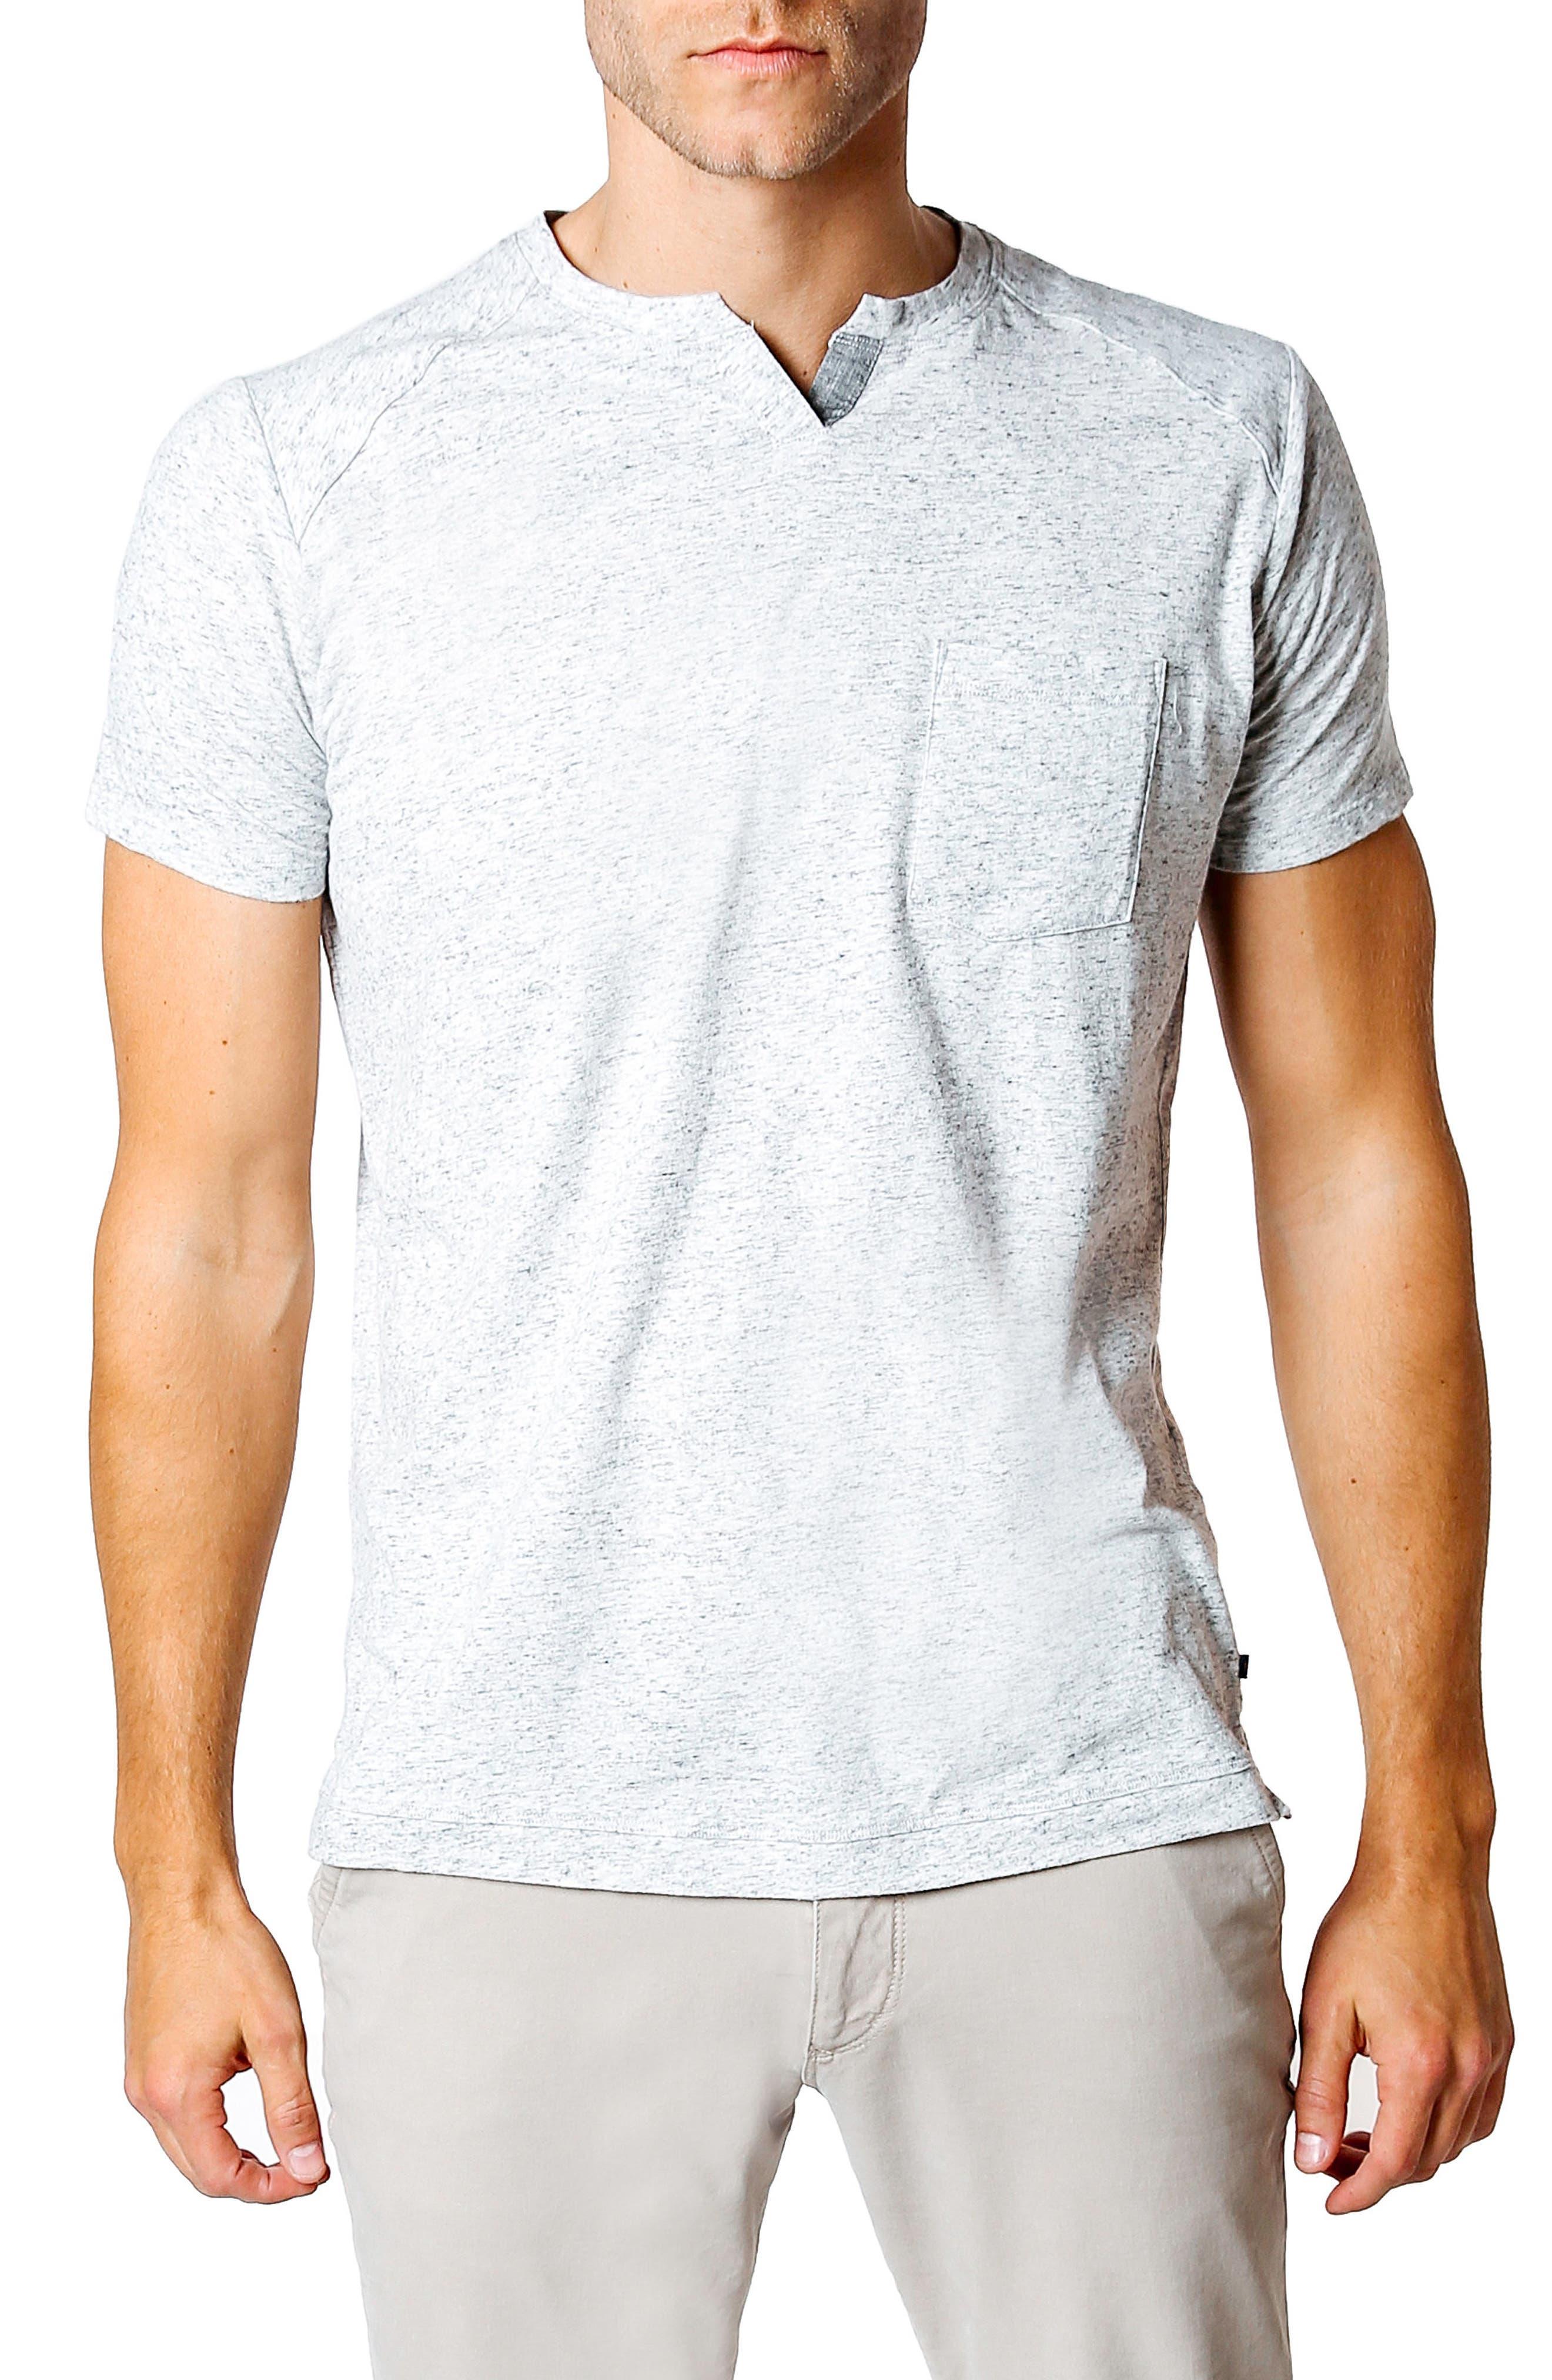 Slim Fit T-Shirt,                             Main thumbnail 1, color,                             GREY HEATHER